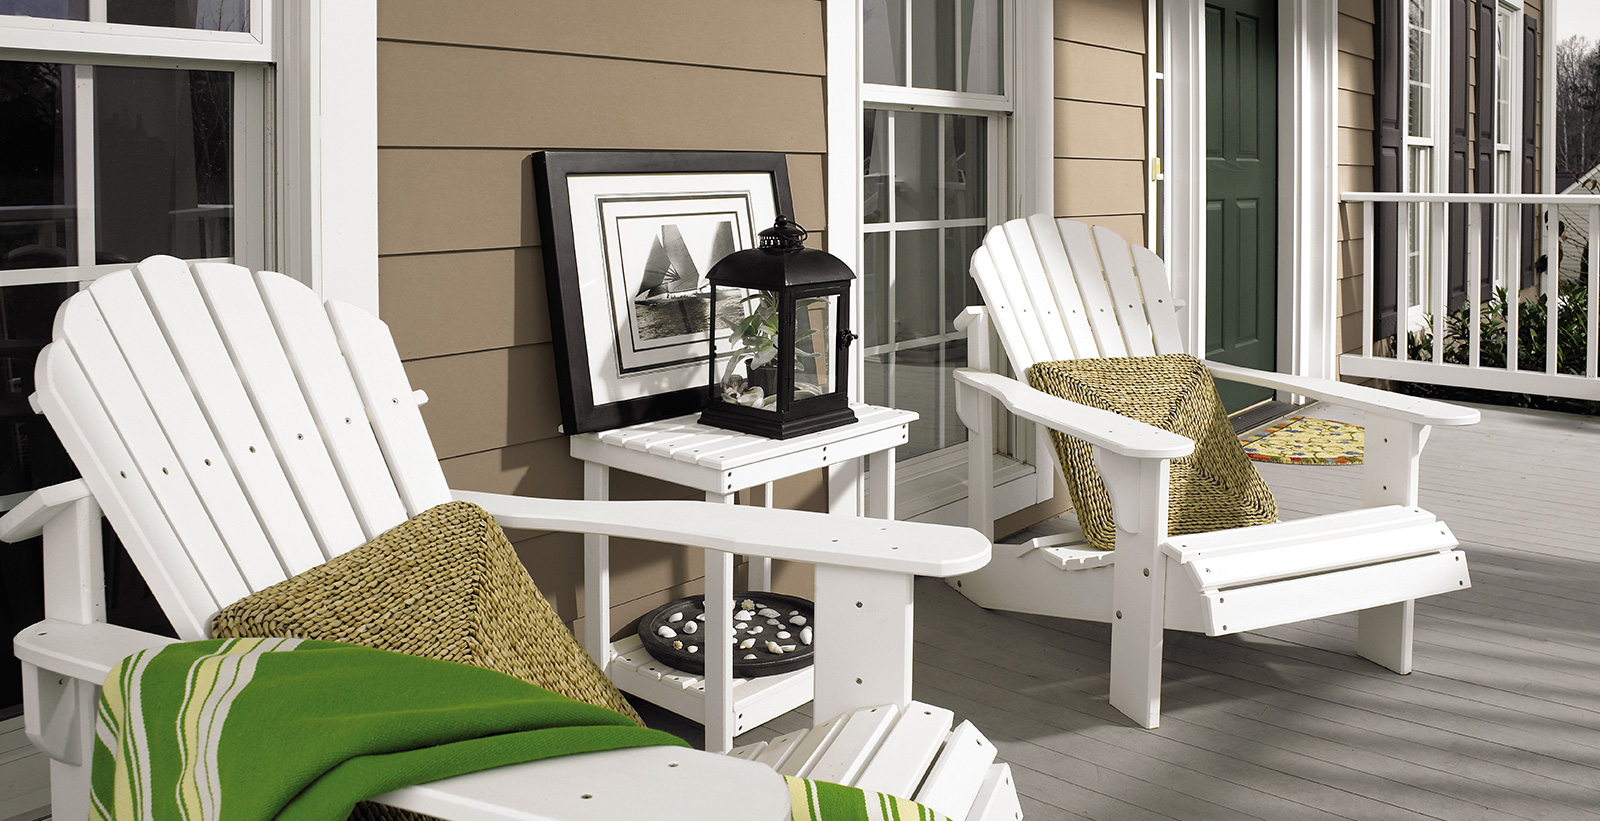 porch exterior color ideas and